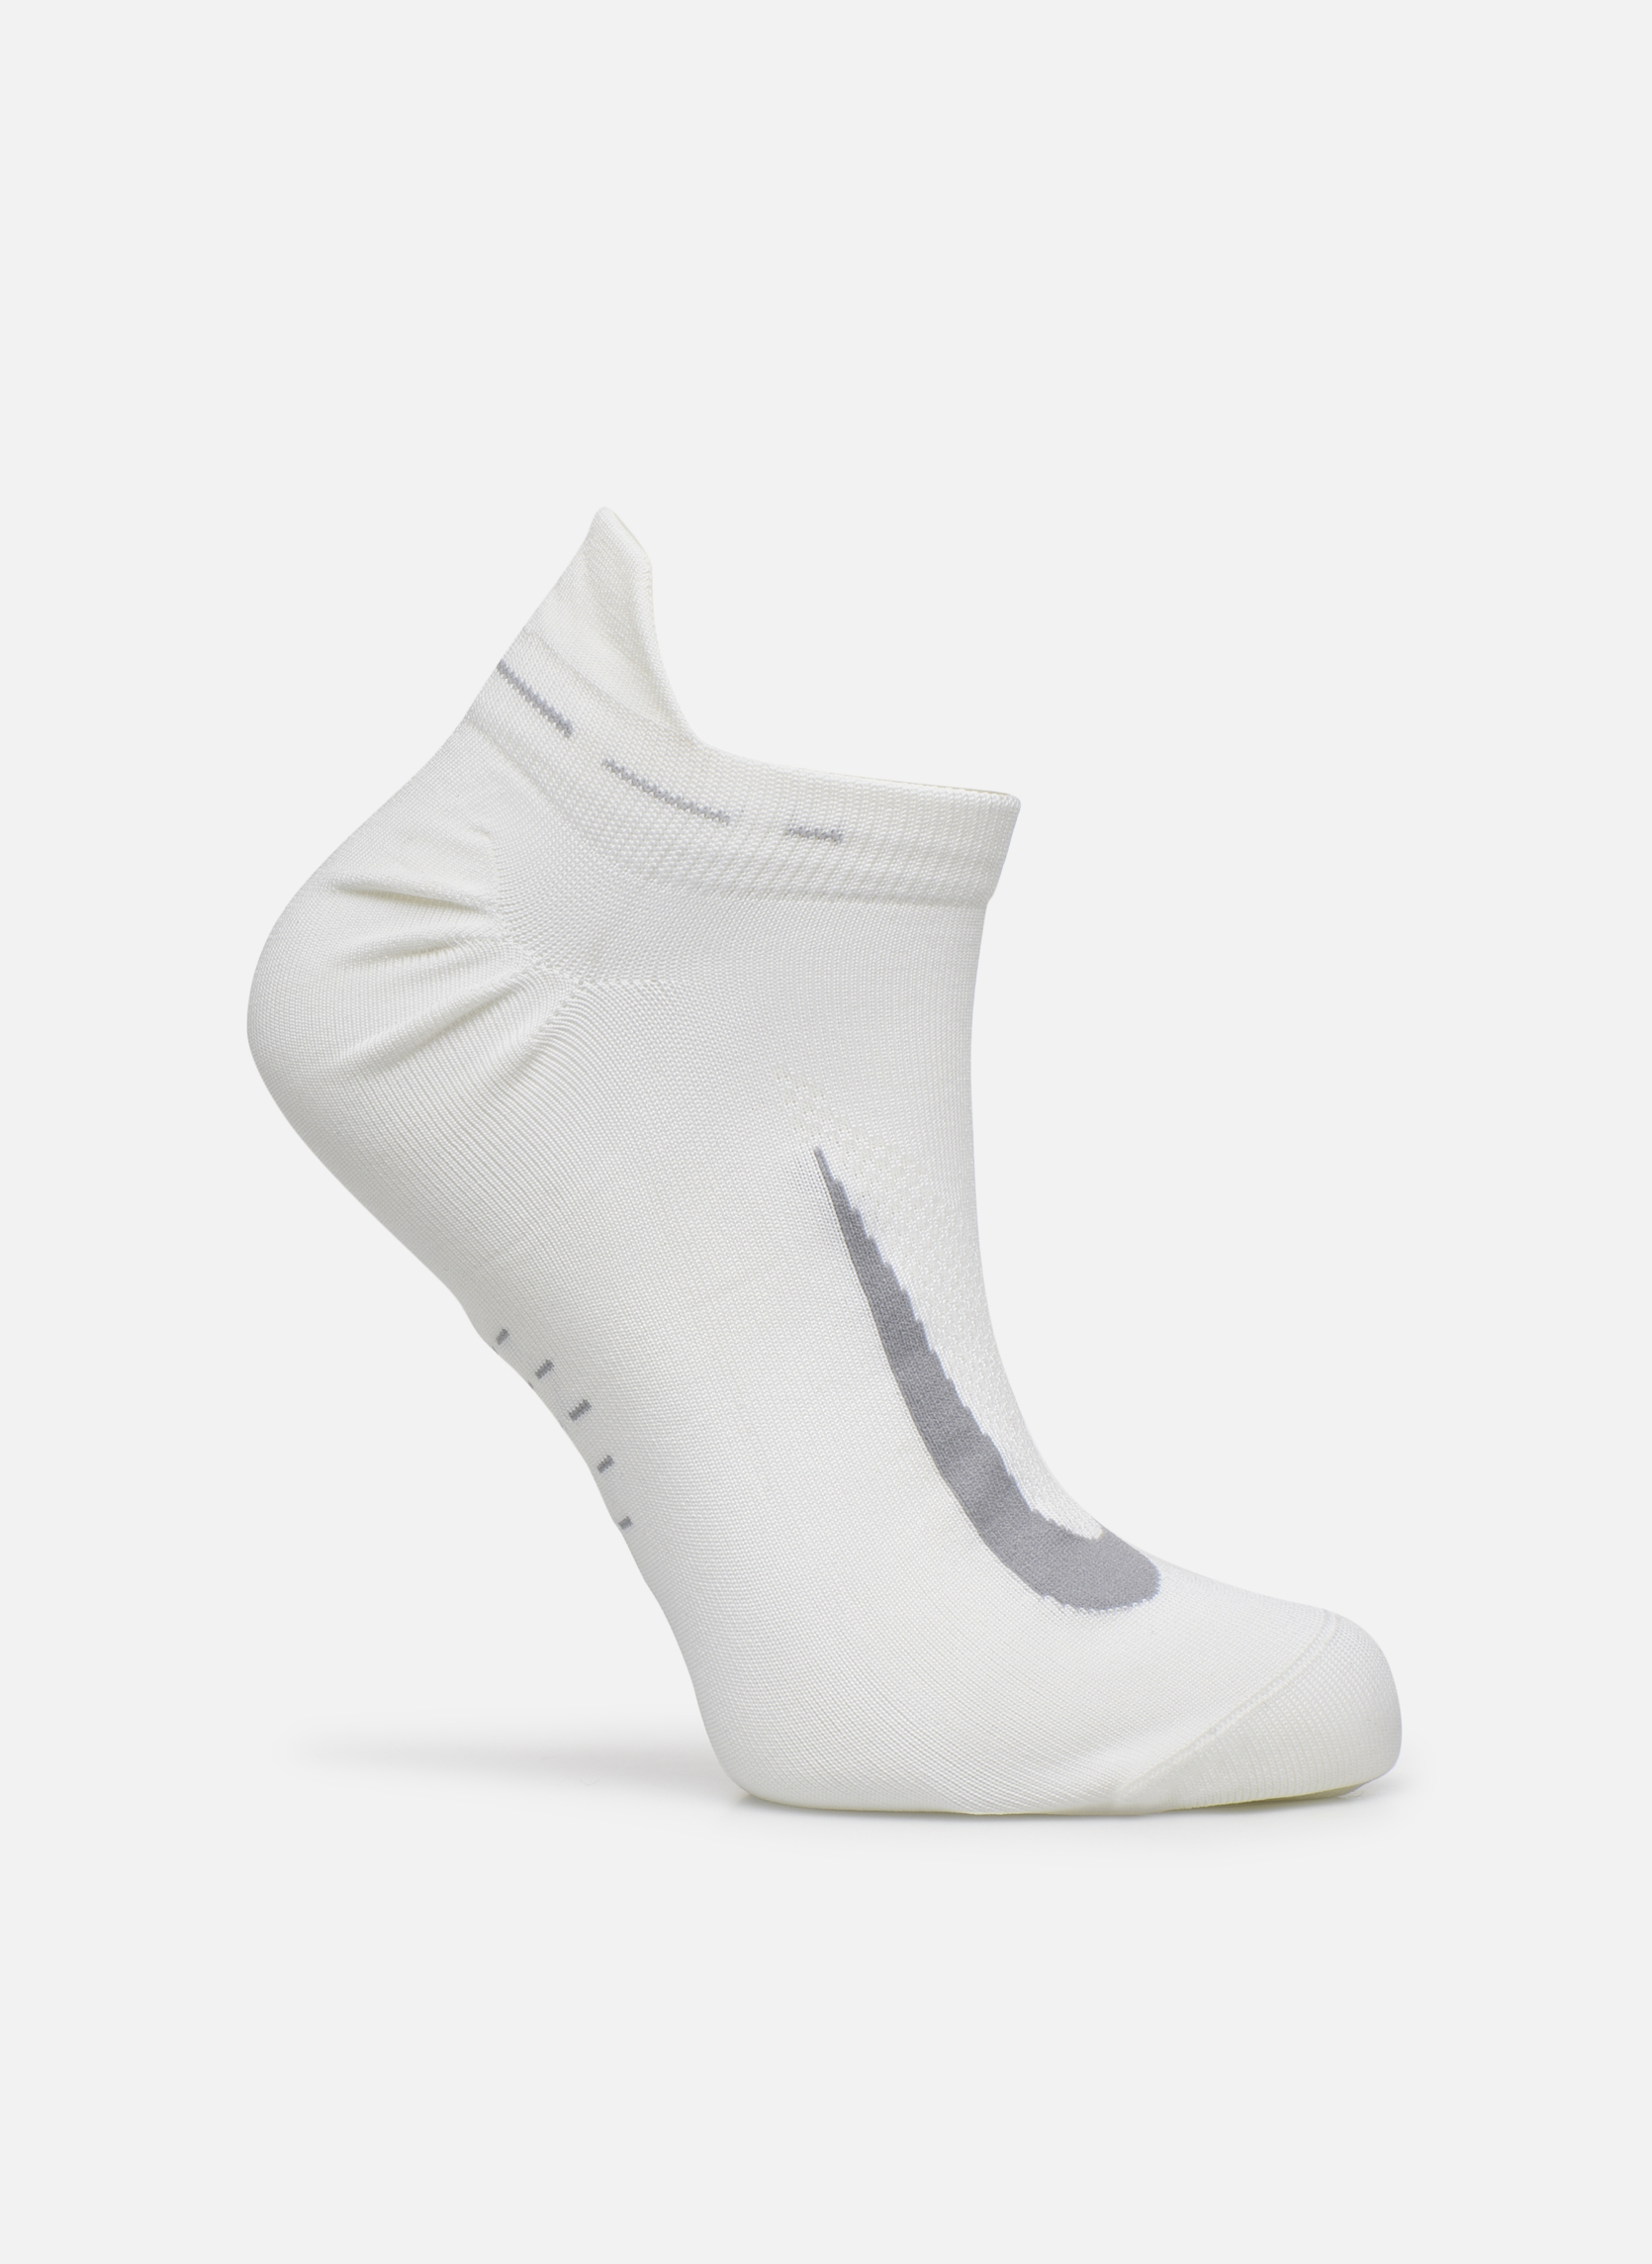 Nike Elite Lightweight No-Show Tab Running Sock